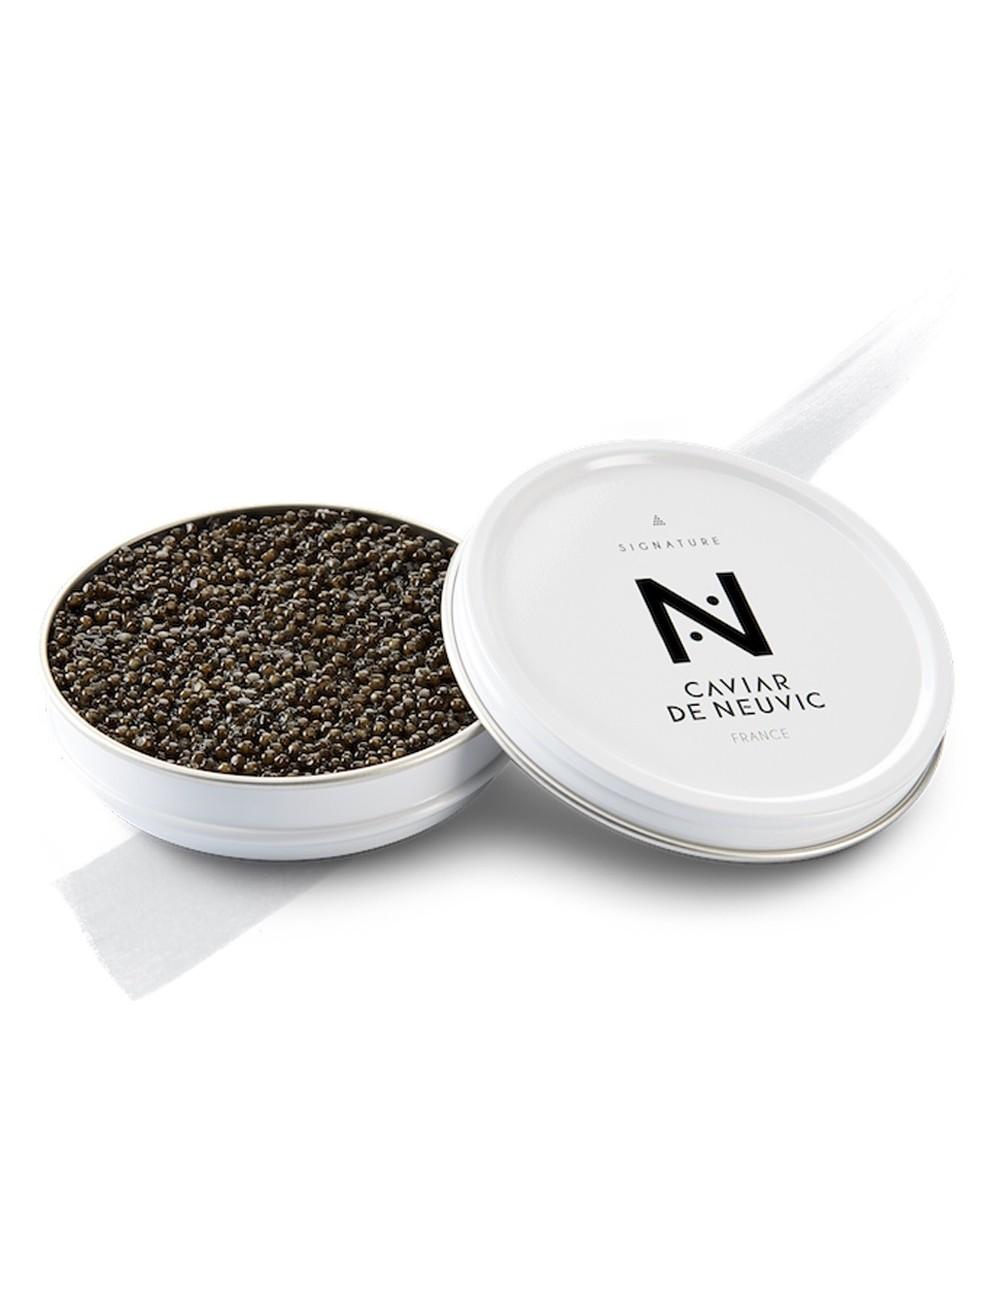 Caviar Signature